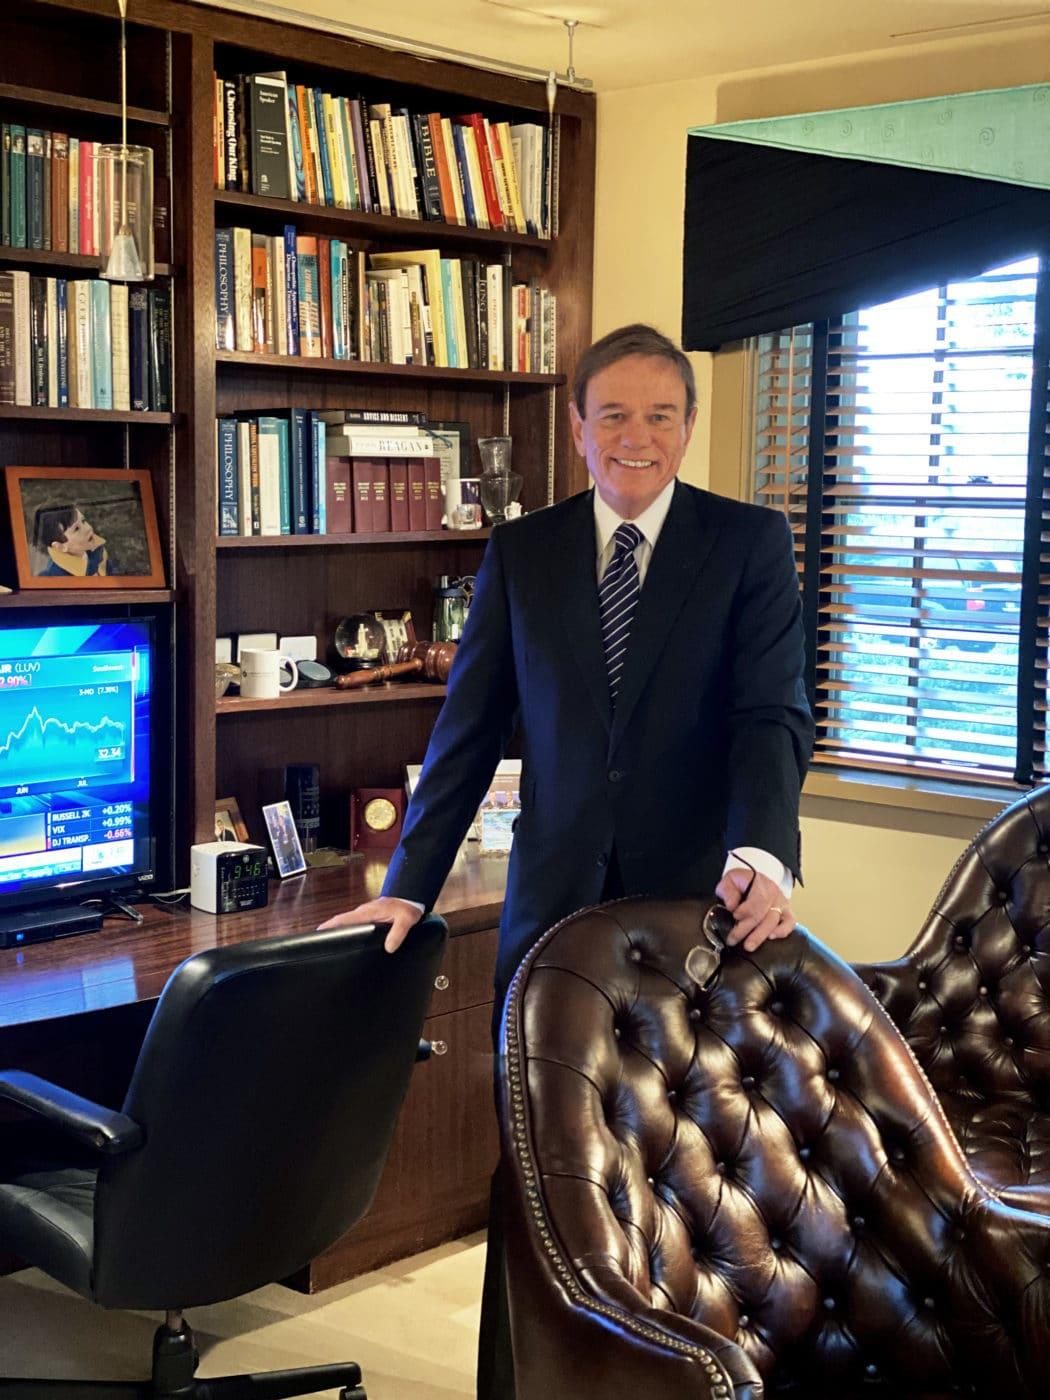 Robert Stack, President & CEO